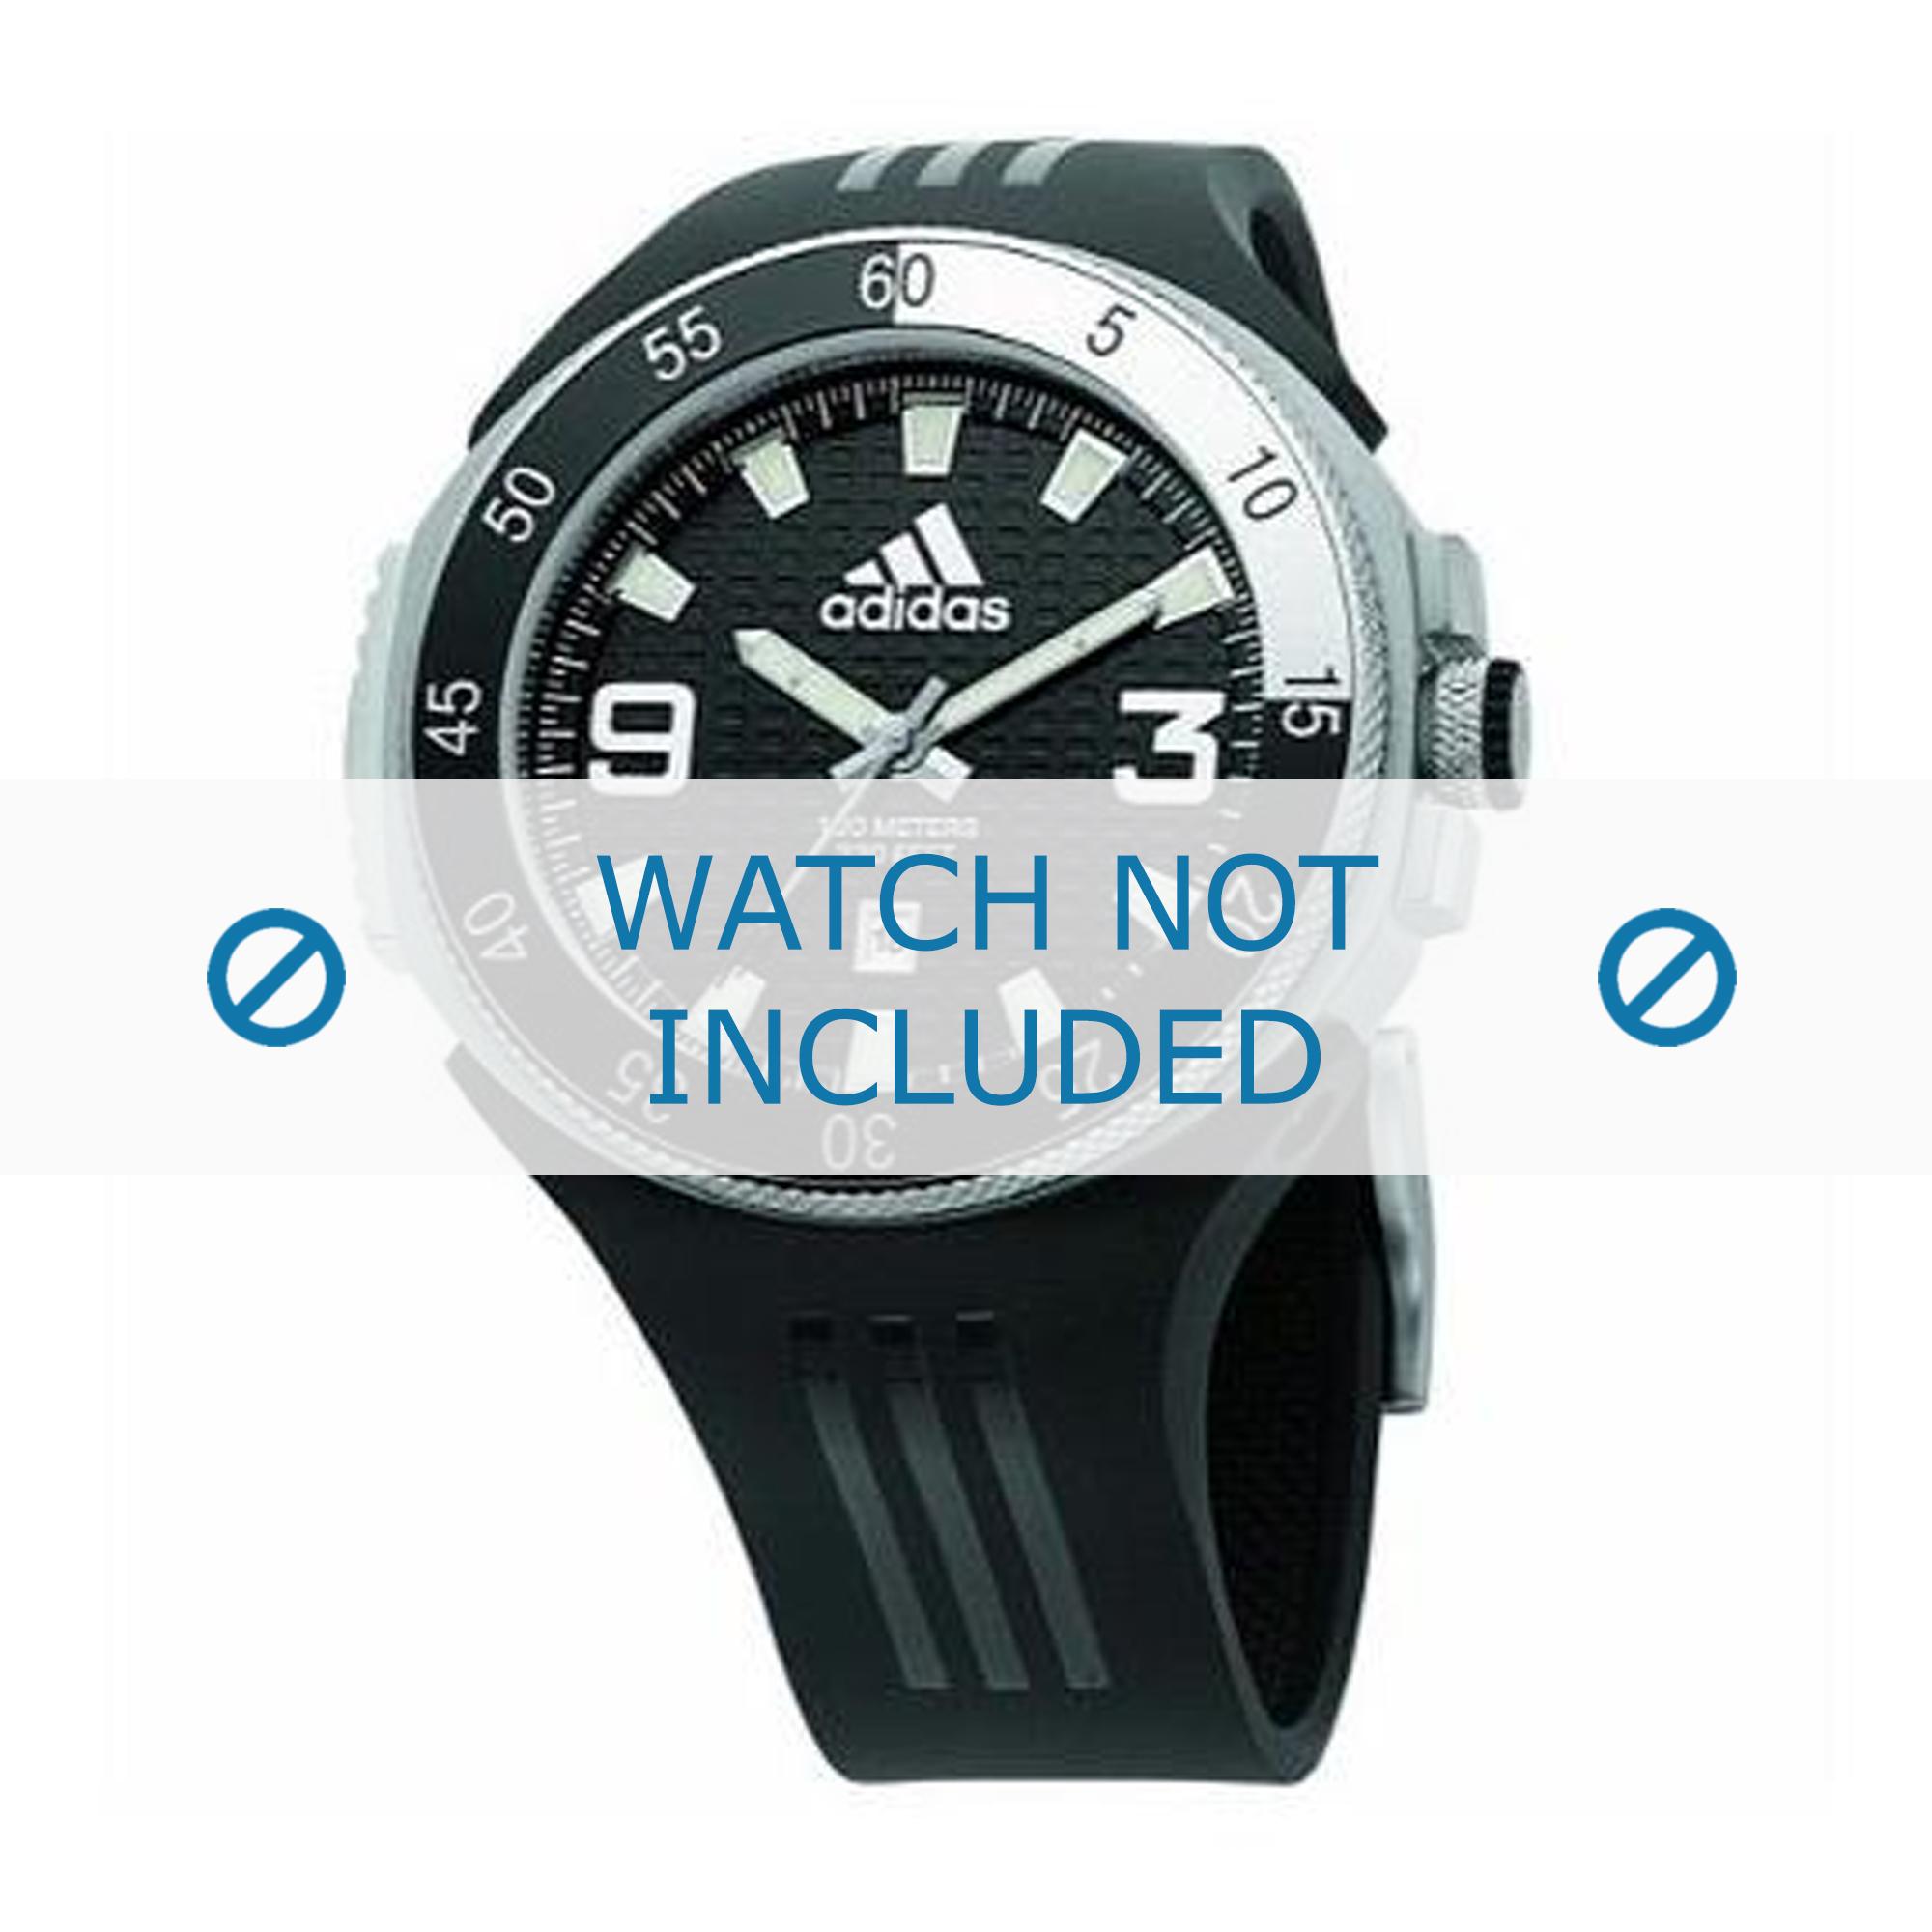 Adidas horlogeband ADP1793 Rubber Zwart